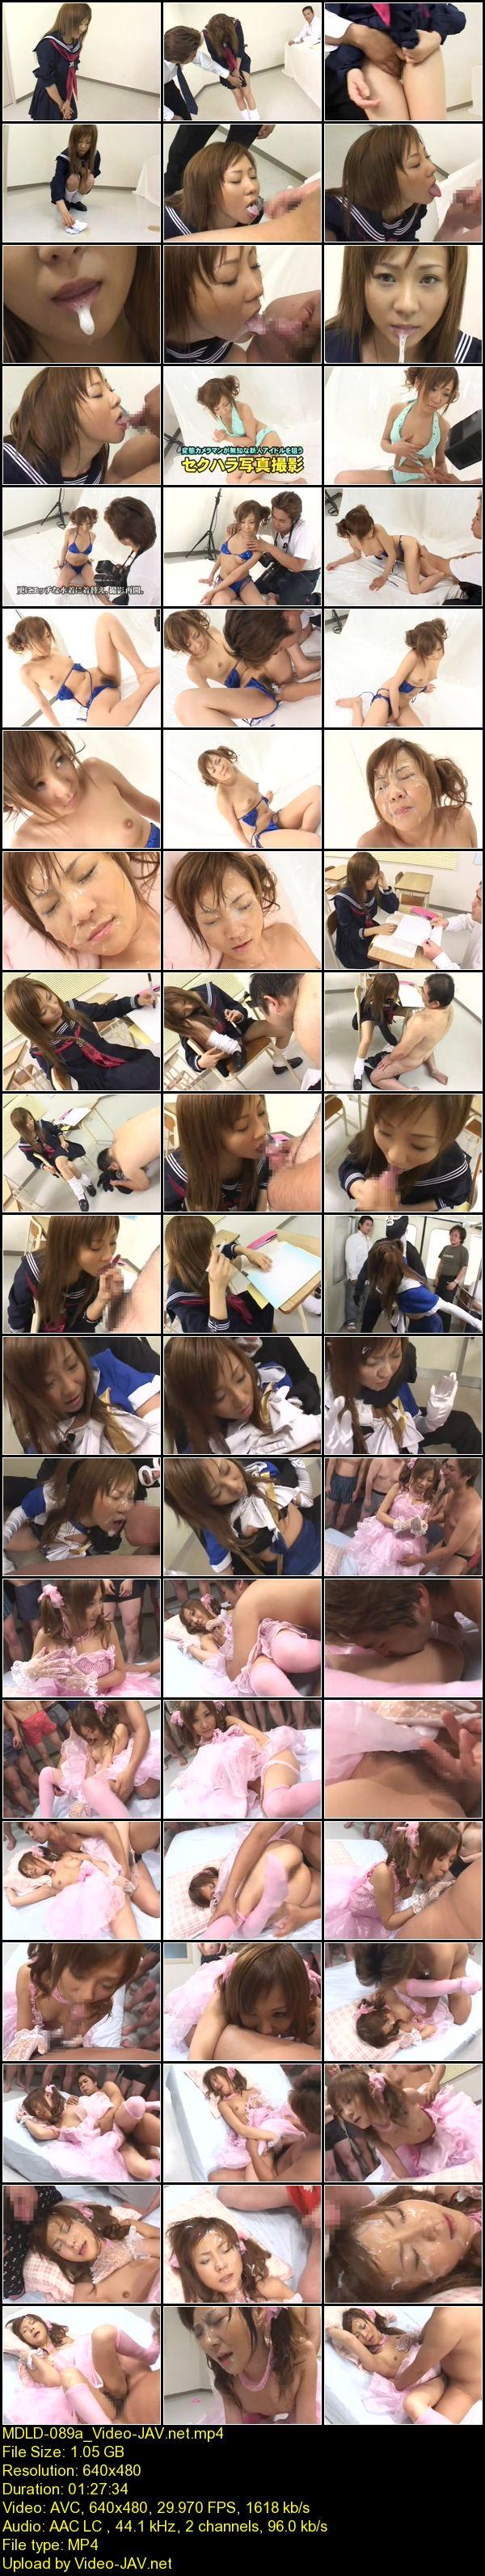 JAV Download Momo Hoshino [MDLD 089] ドリームウーマン×ザーメン酔挙 DX2 星野桃 LEGEND MOODYZ(ムーディーズ) 2003 11 01